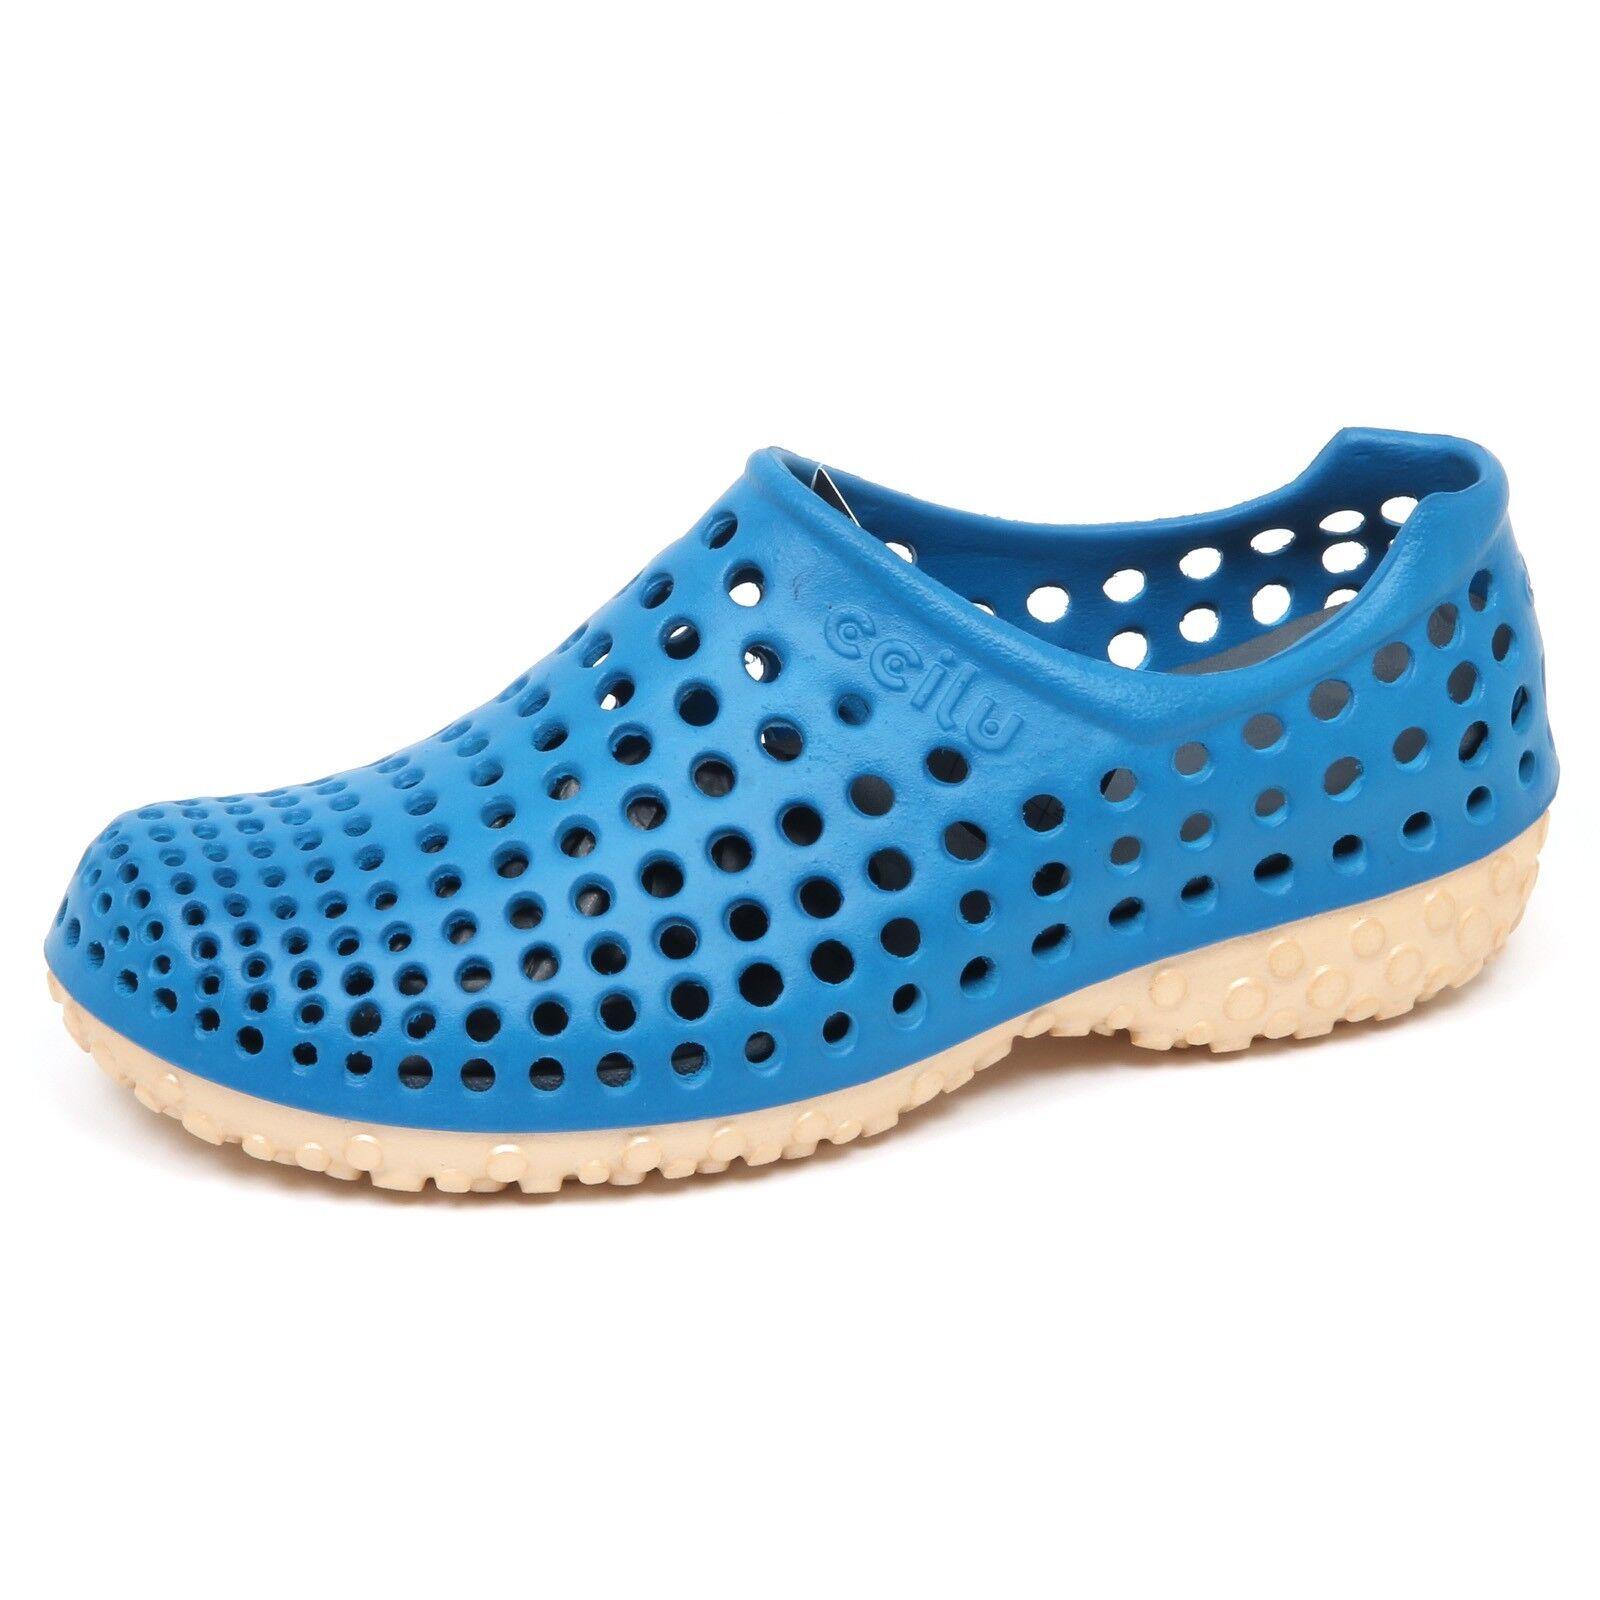 E8174 (WITHOUT BOX) sneaker uomo rubber blu CCILU CELL sandal slip on shoe man